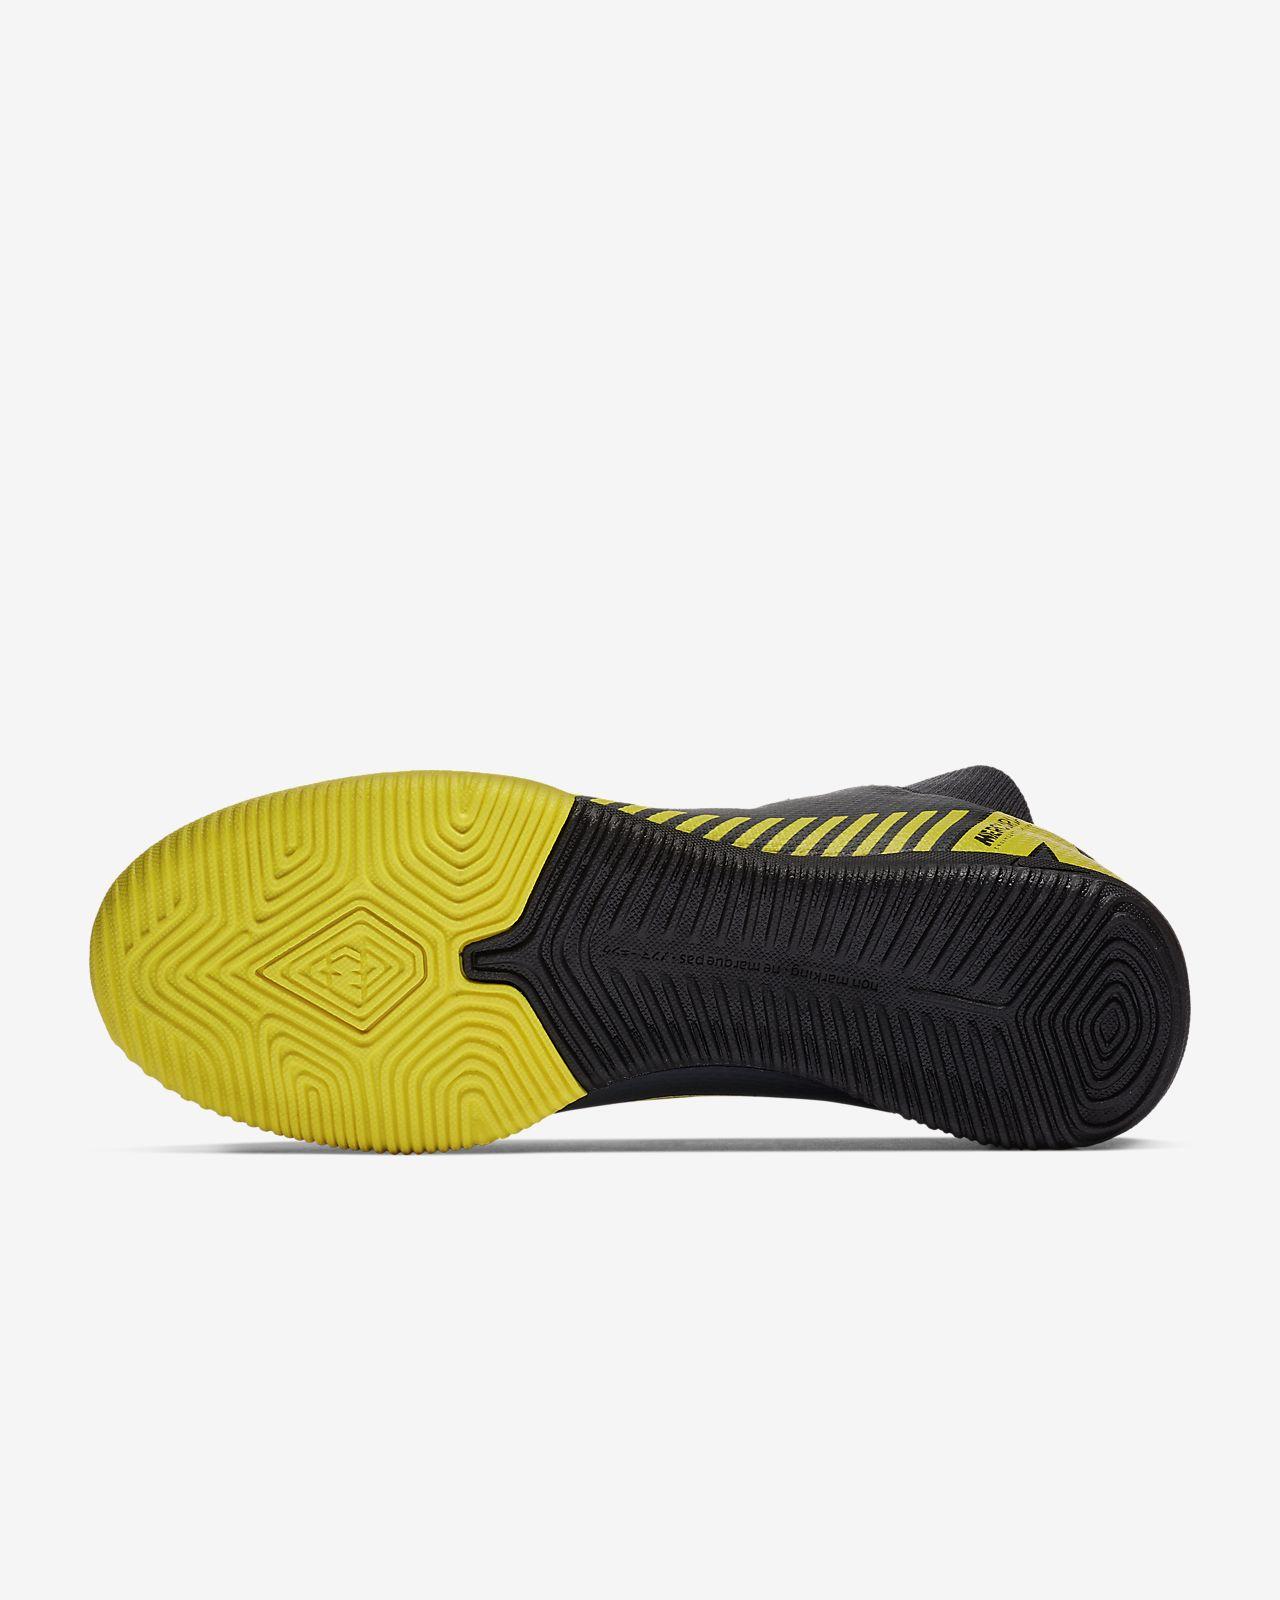 e79228a70a2e Nike SuperflyX 6 Academy IC Indoor Court Football Boot. Nike.com IE